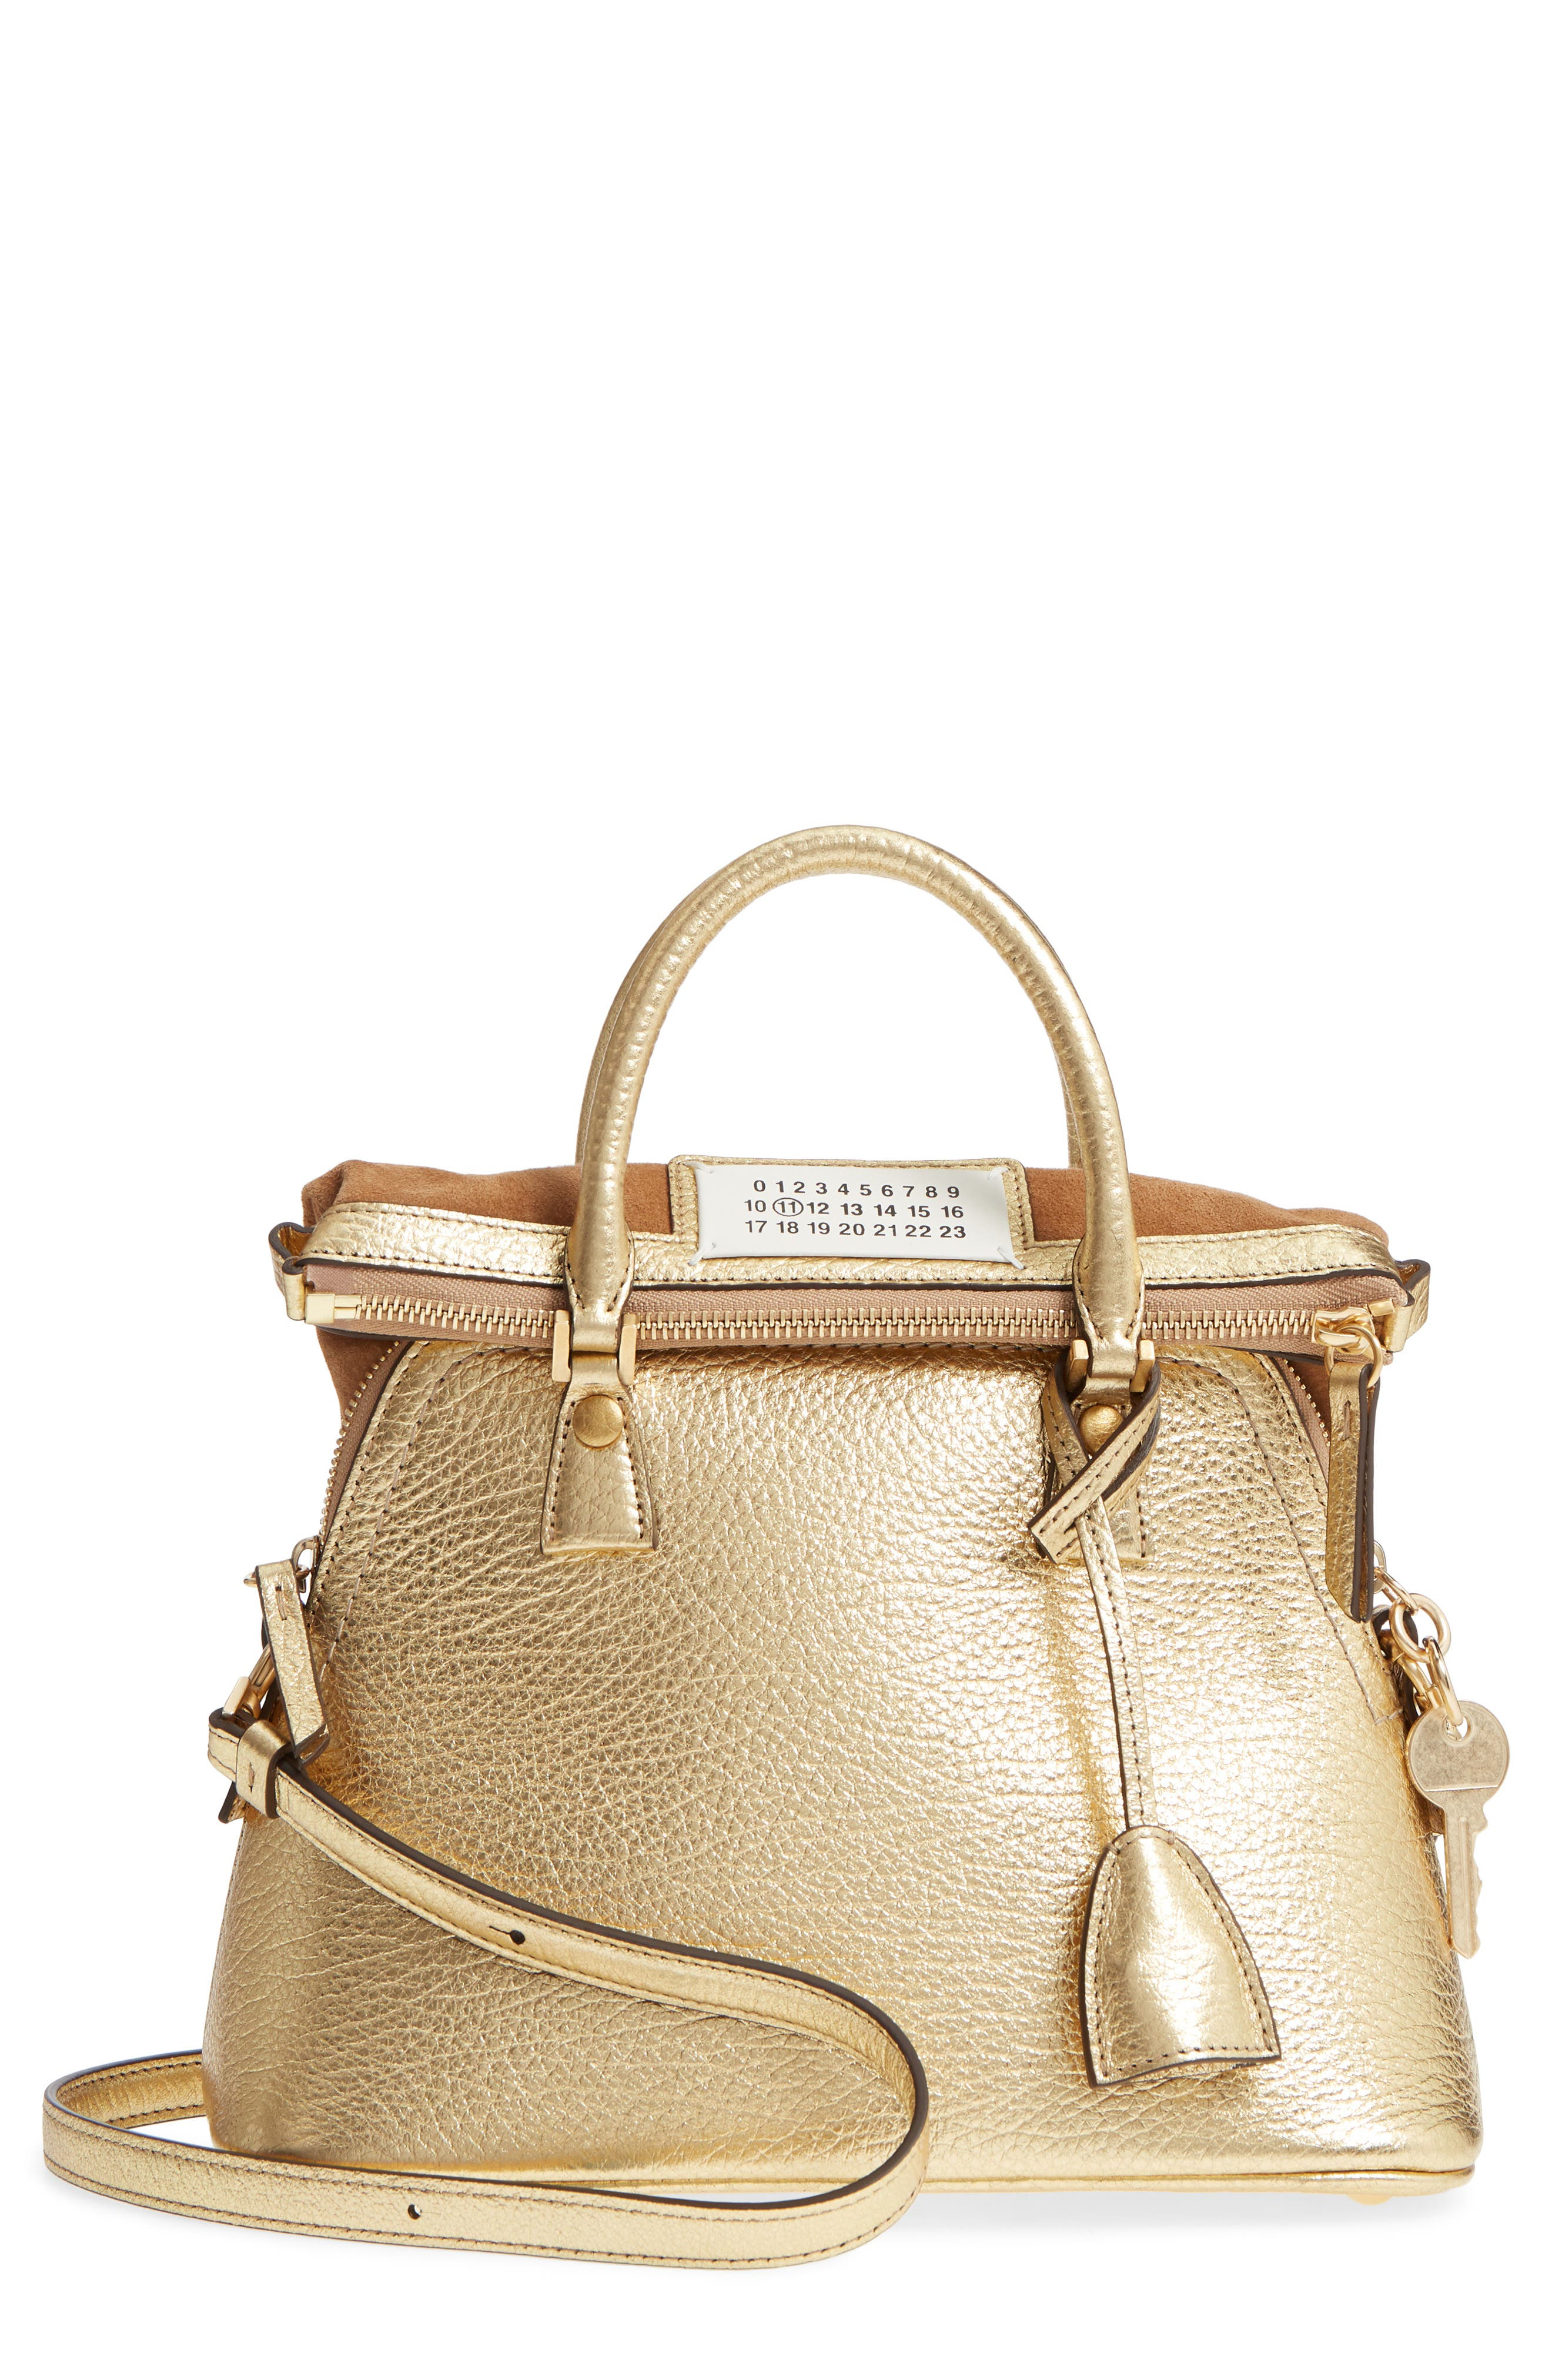 Small 5AC Calfskin Leather Handbag,                         Main,                         color, Gold